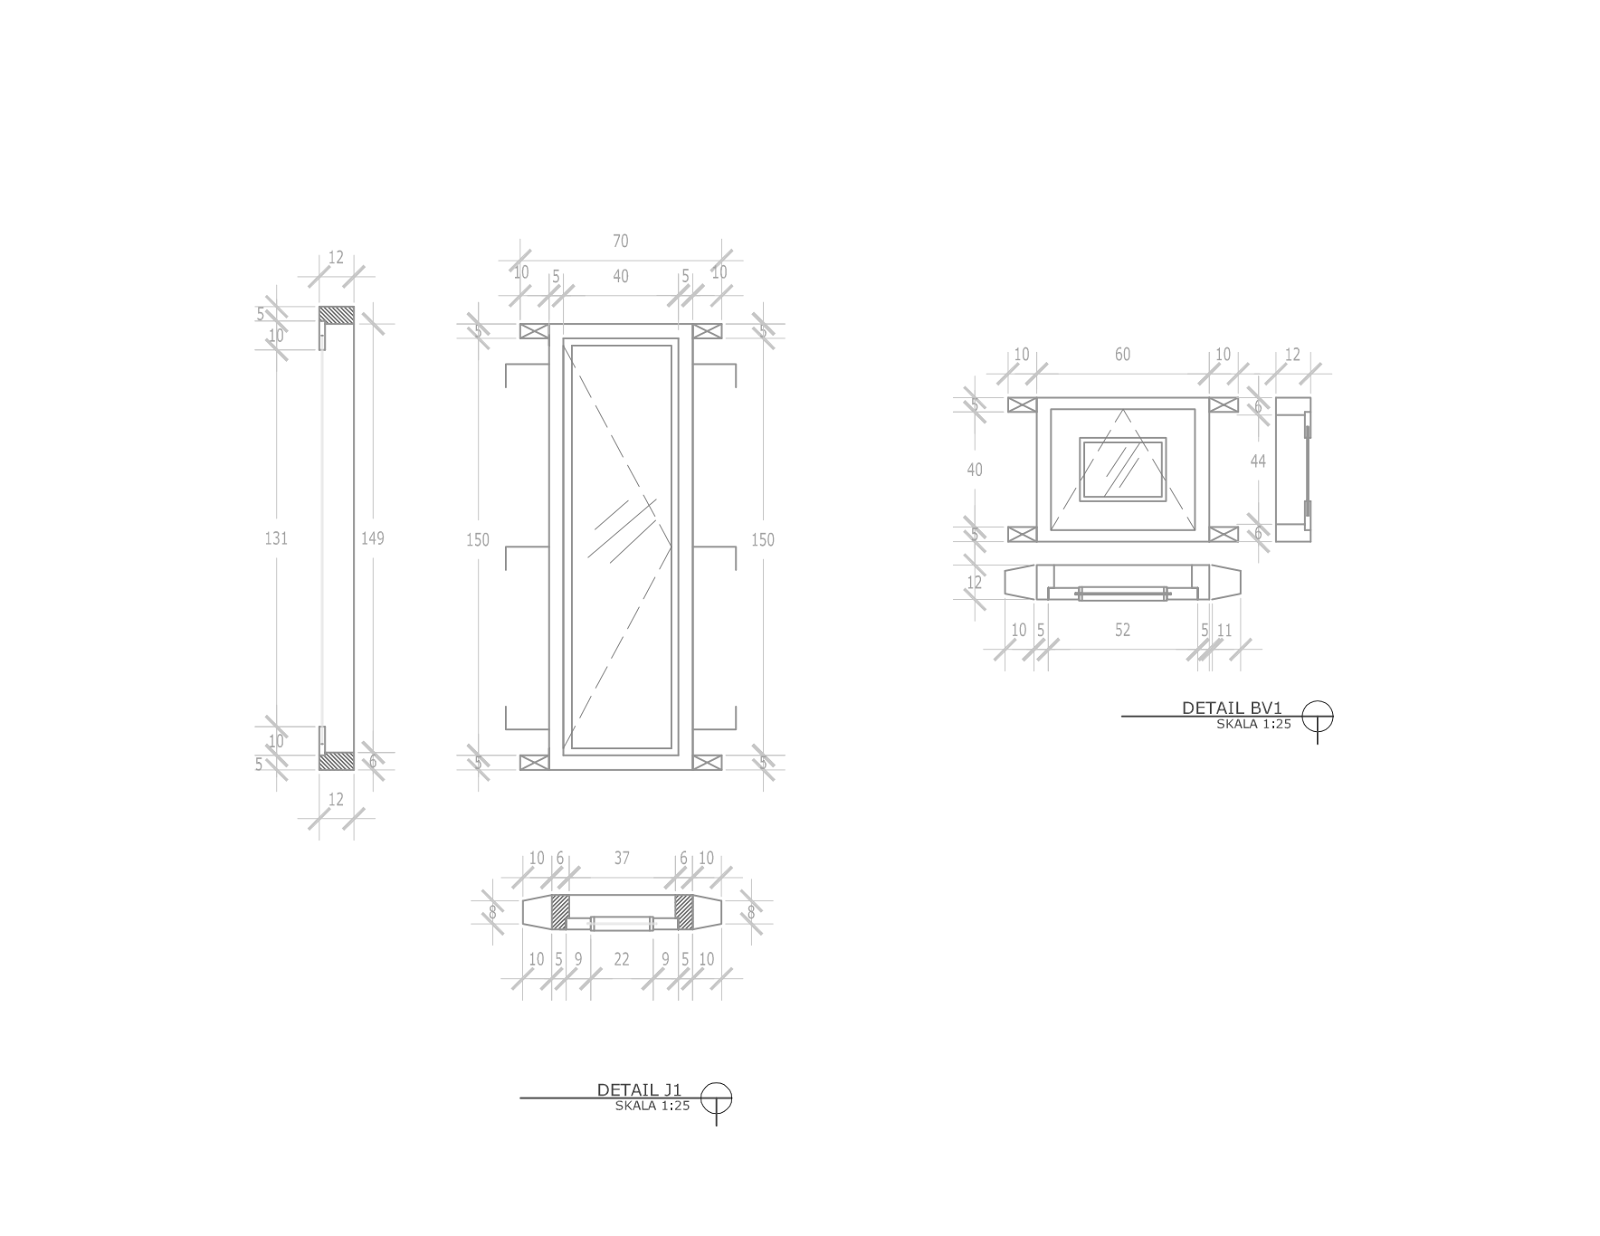 contoh gambar kerja lengkap rumah 1 lantai minimalis di